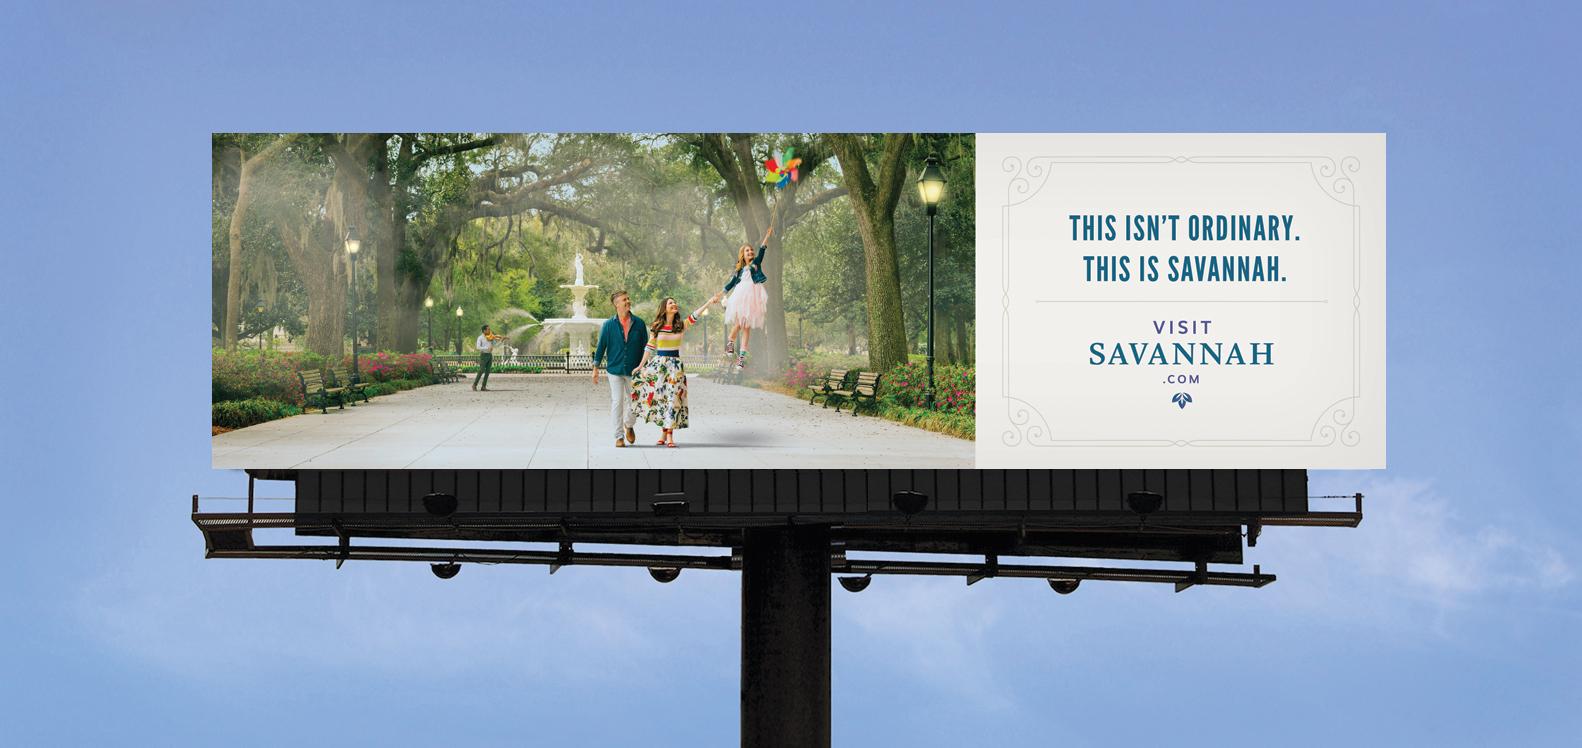 visit-savannah-OOH-forsyth.jpg